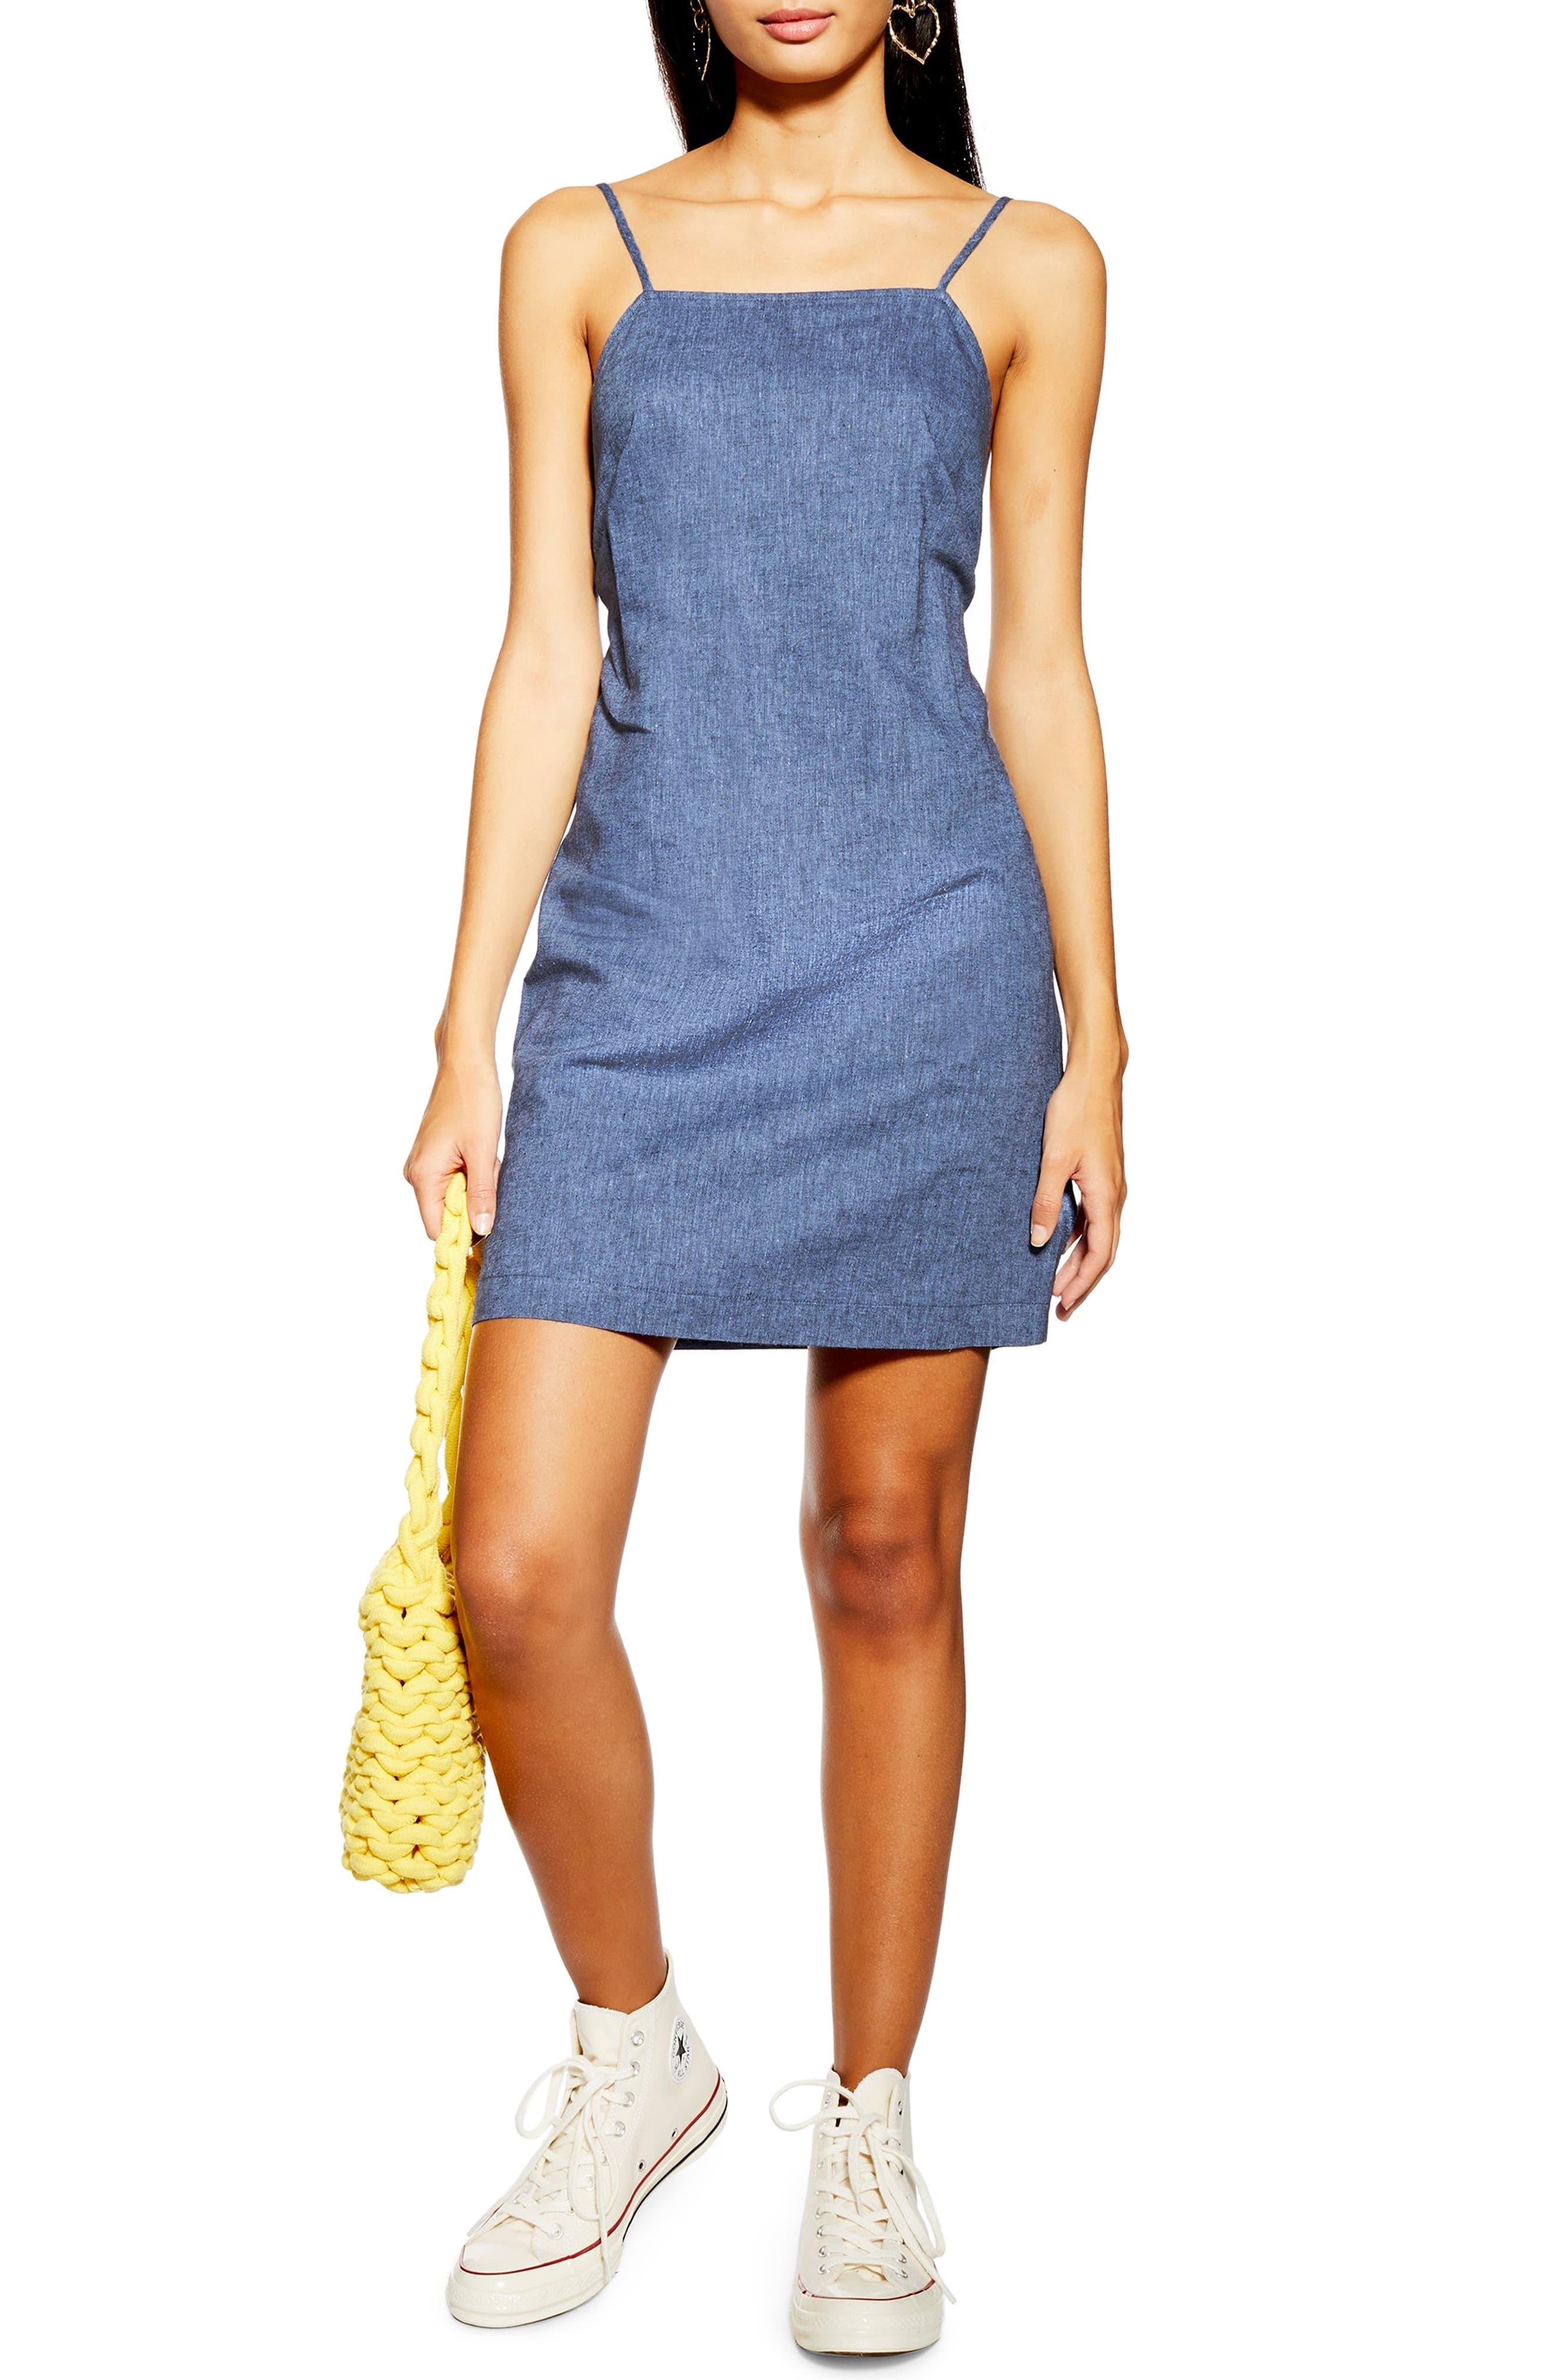 Topshop Sleeveless Chambray Minidress, US (fits like 14) - Blue